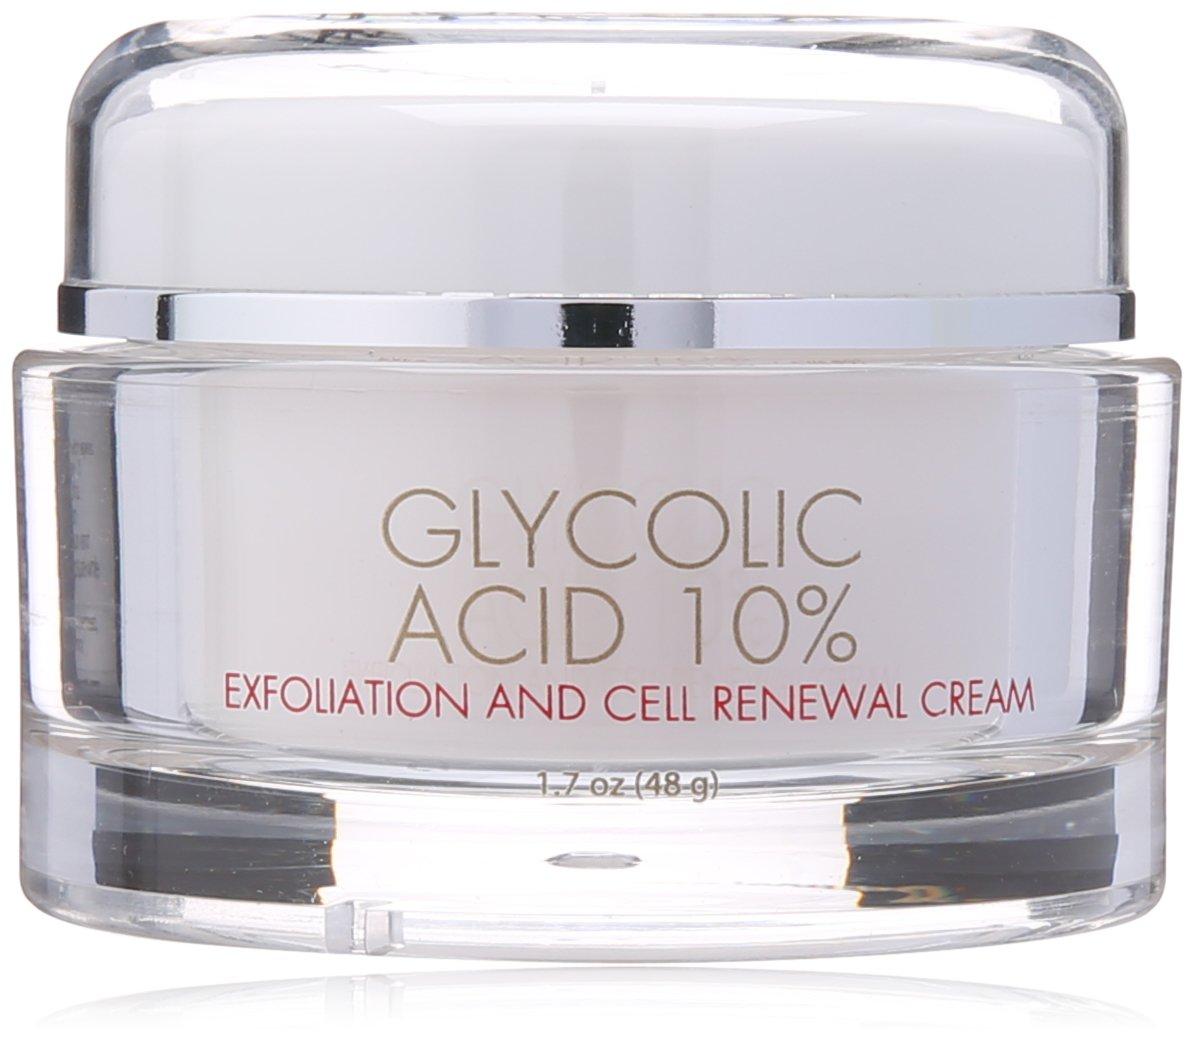 Life-Flo Body Cream, Glycolic Acid 10%, 1.7 Ounce